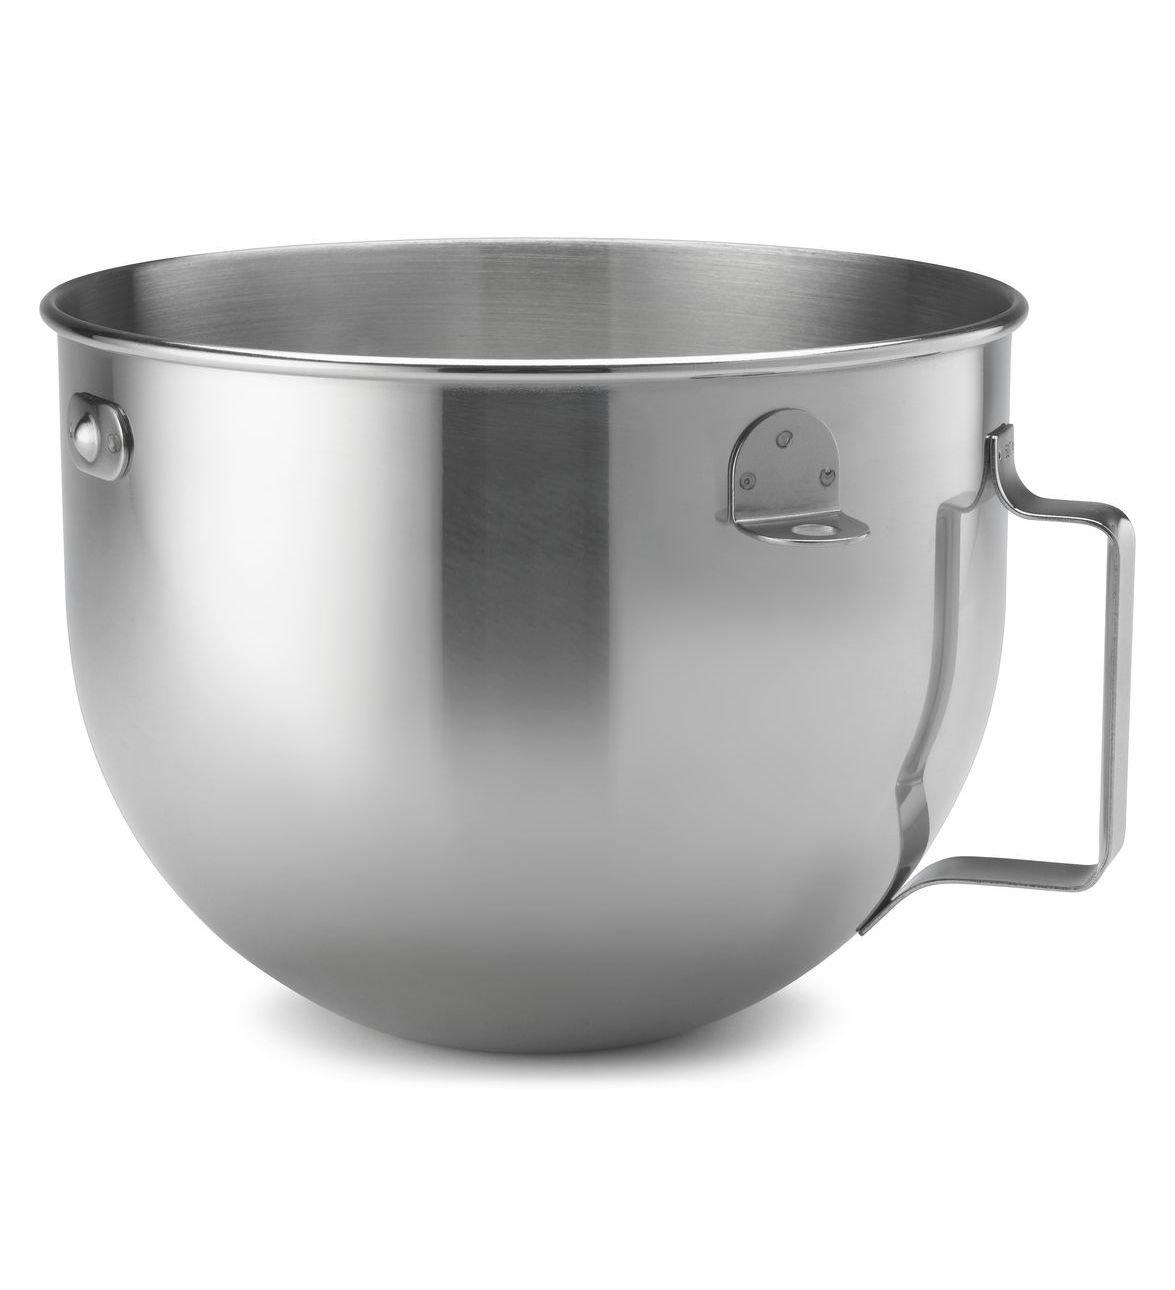 KitchenAid KN25PBH 5QT. Polished Bowl with Strap Hand by KitchenAid